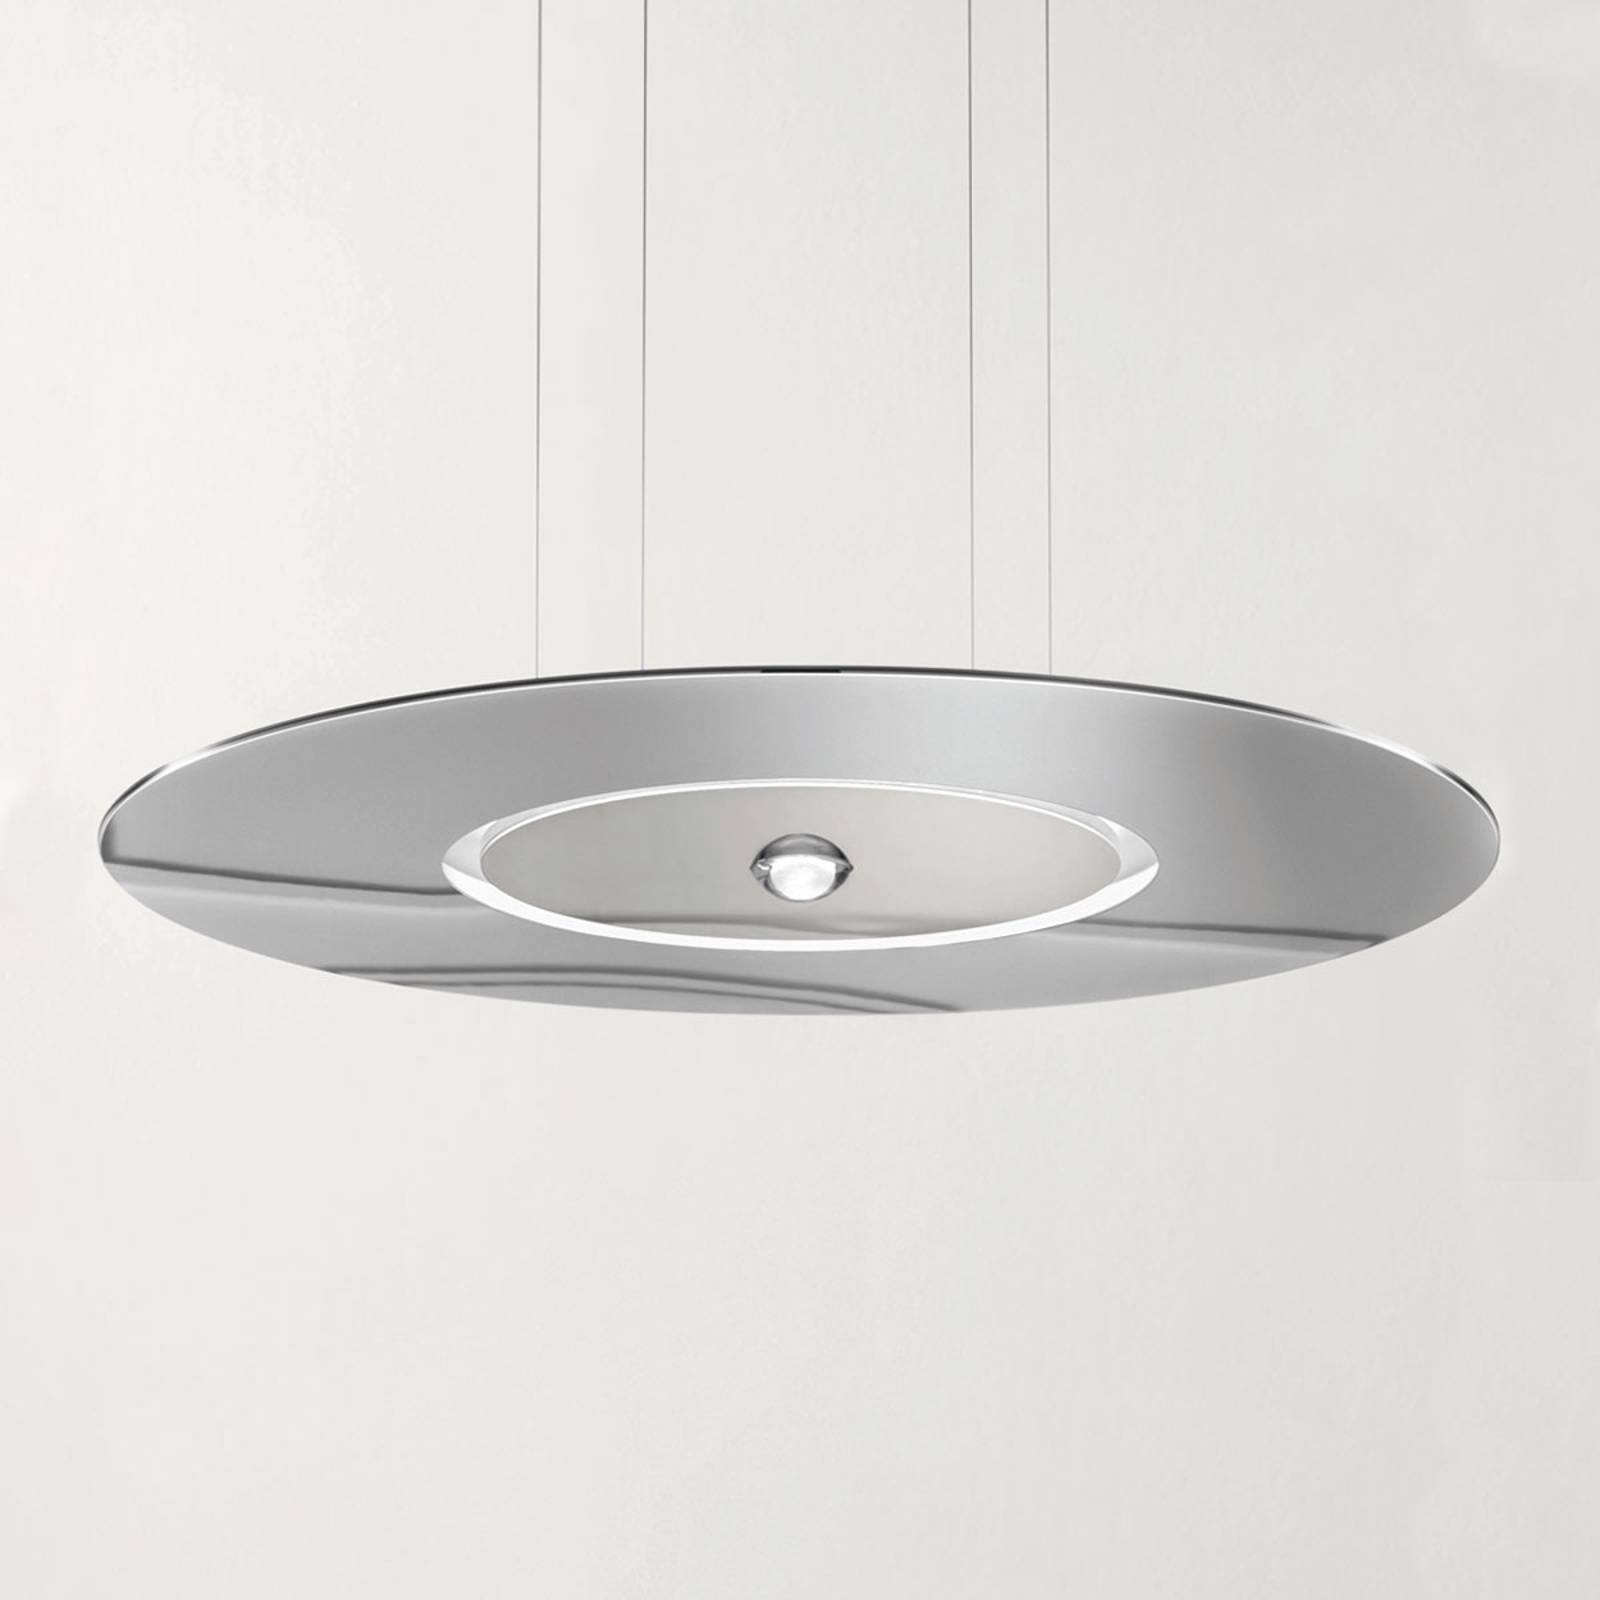 Cini&Nils Passepartout55 LED-riippuvalaisin kromi